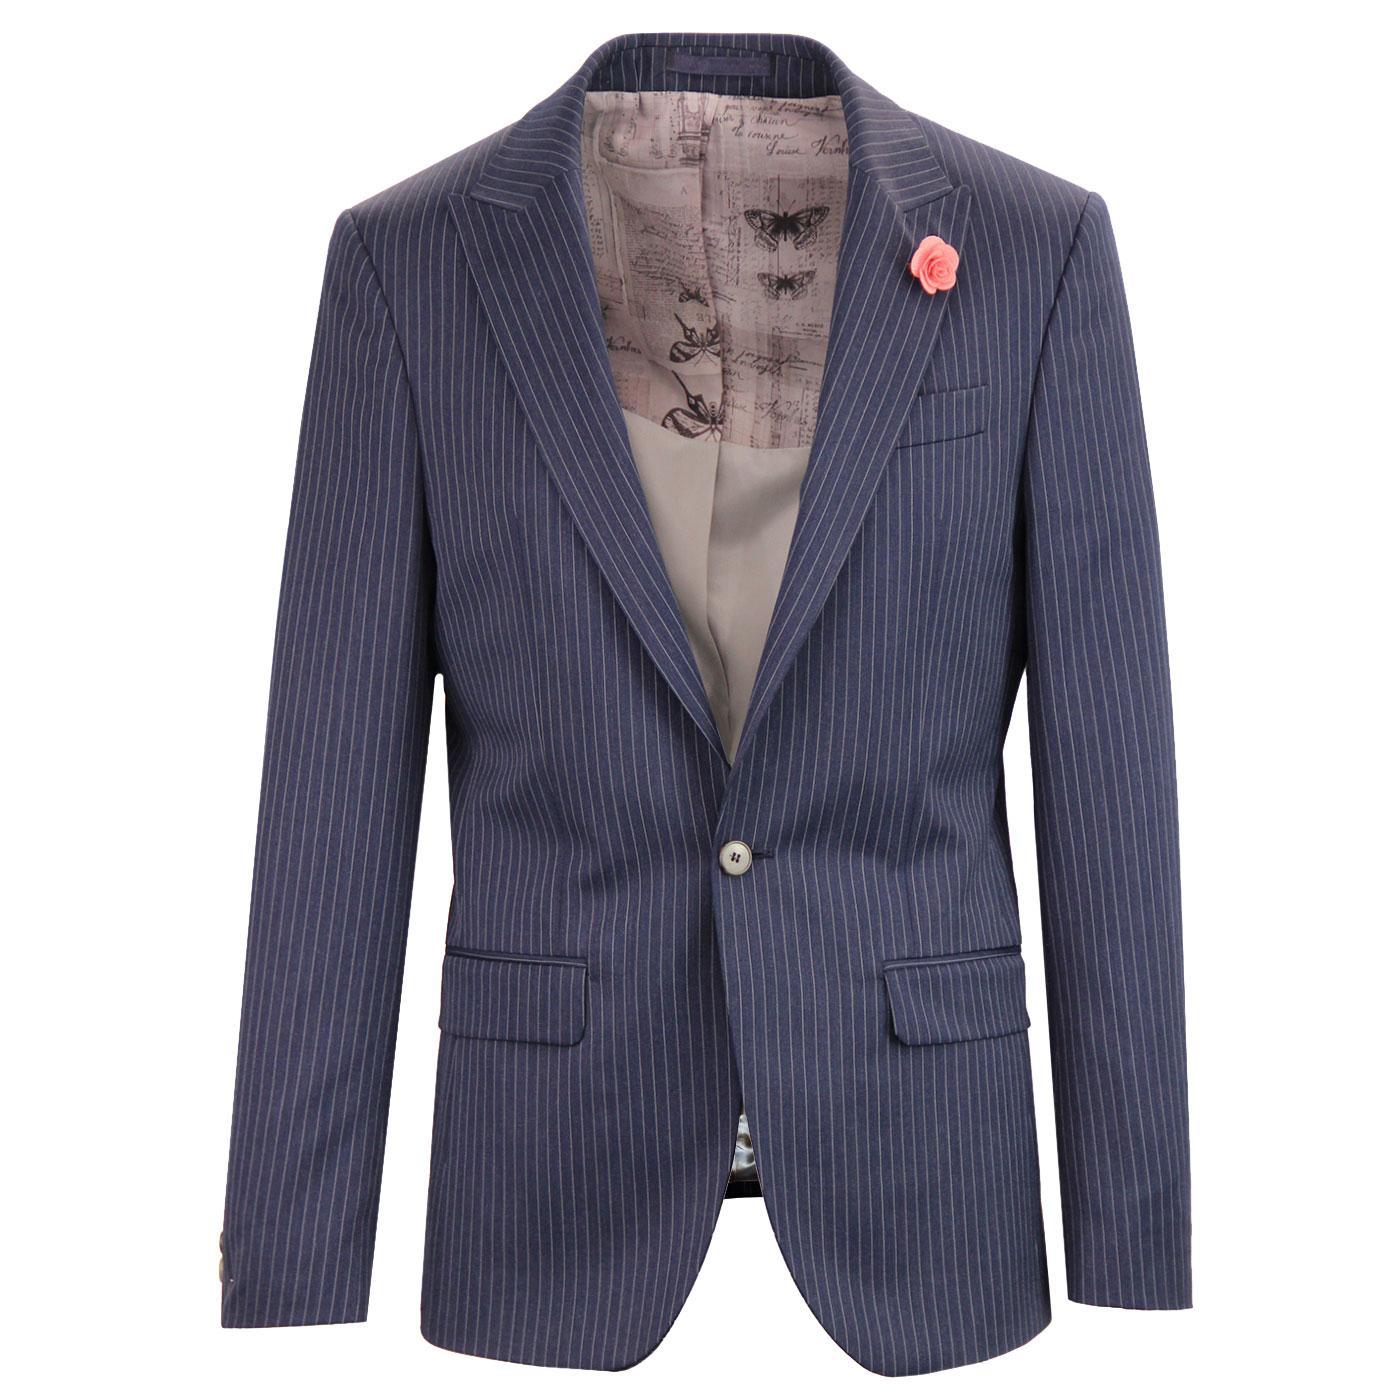 Men's 60s Mod Tailored Pinstripe Suit Jacket NAVY